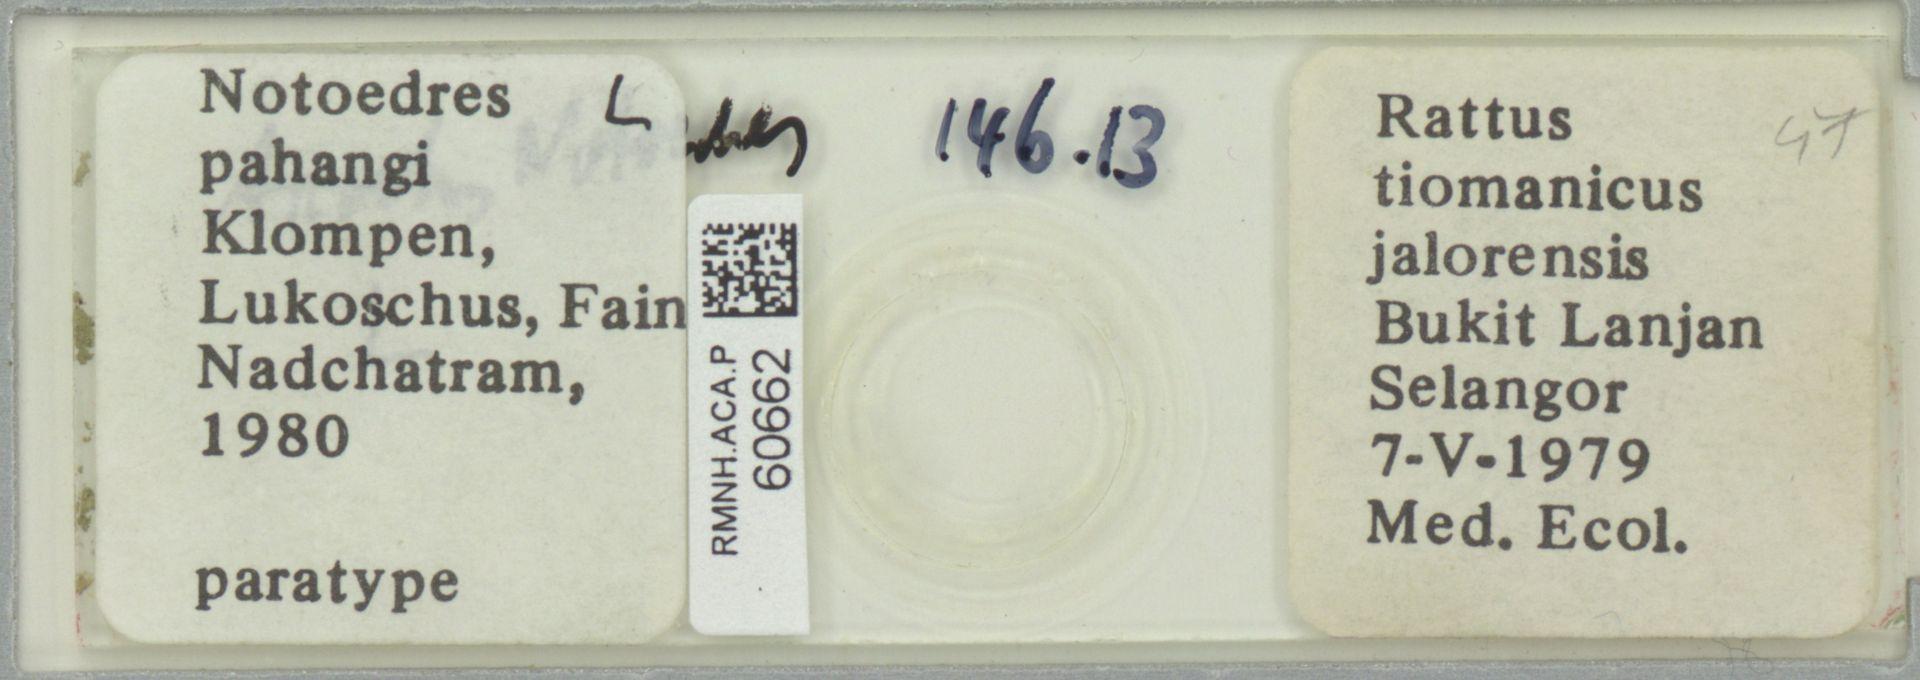 RMNH.ACA.P.60662 | Notoedres pahangi Klompen, Lukoschus, Fain & Nadchatram 1980